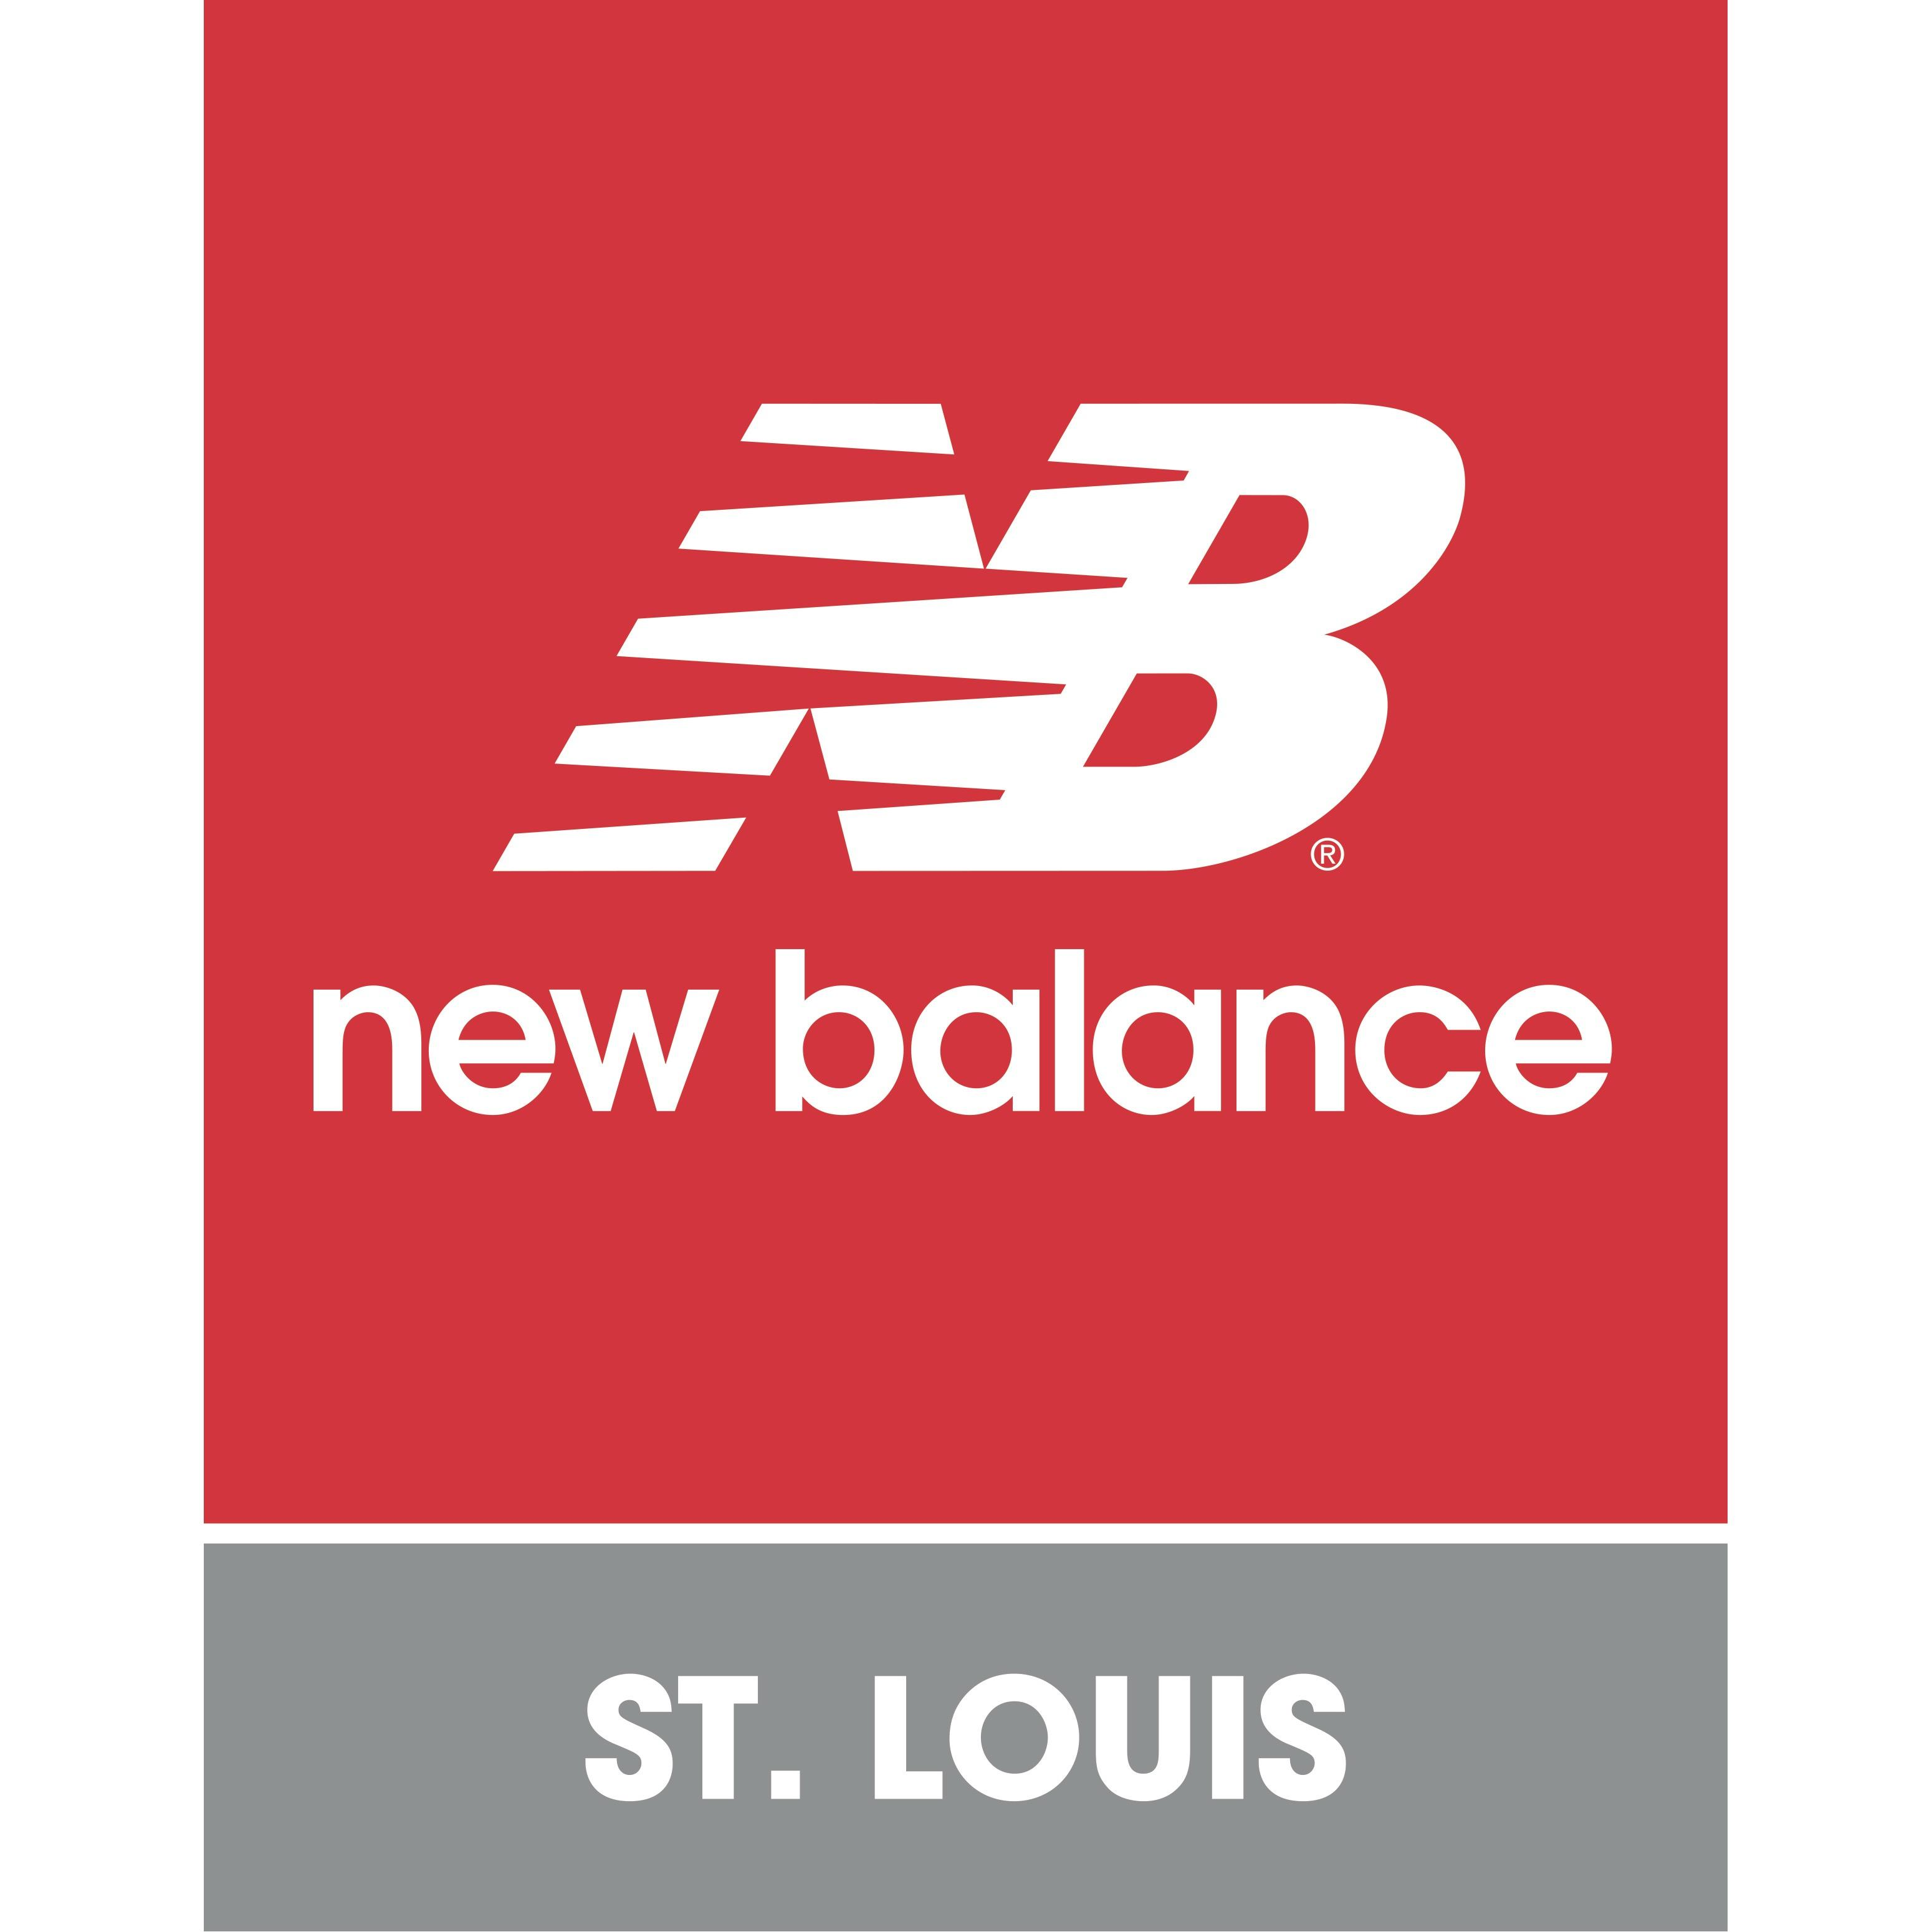 New Balance St. Louis